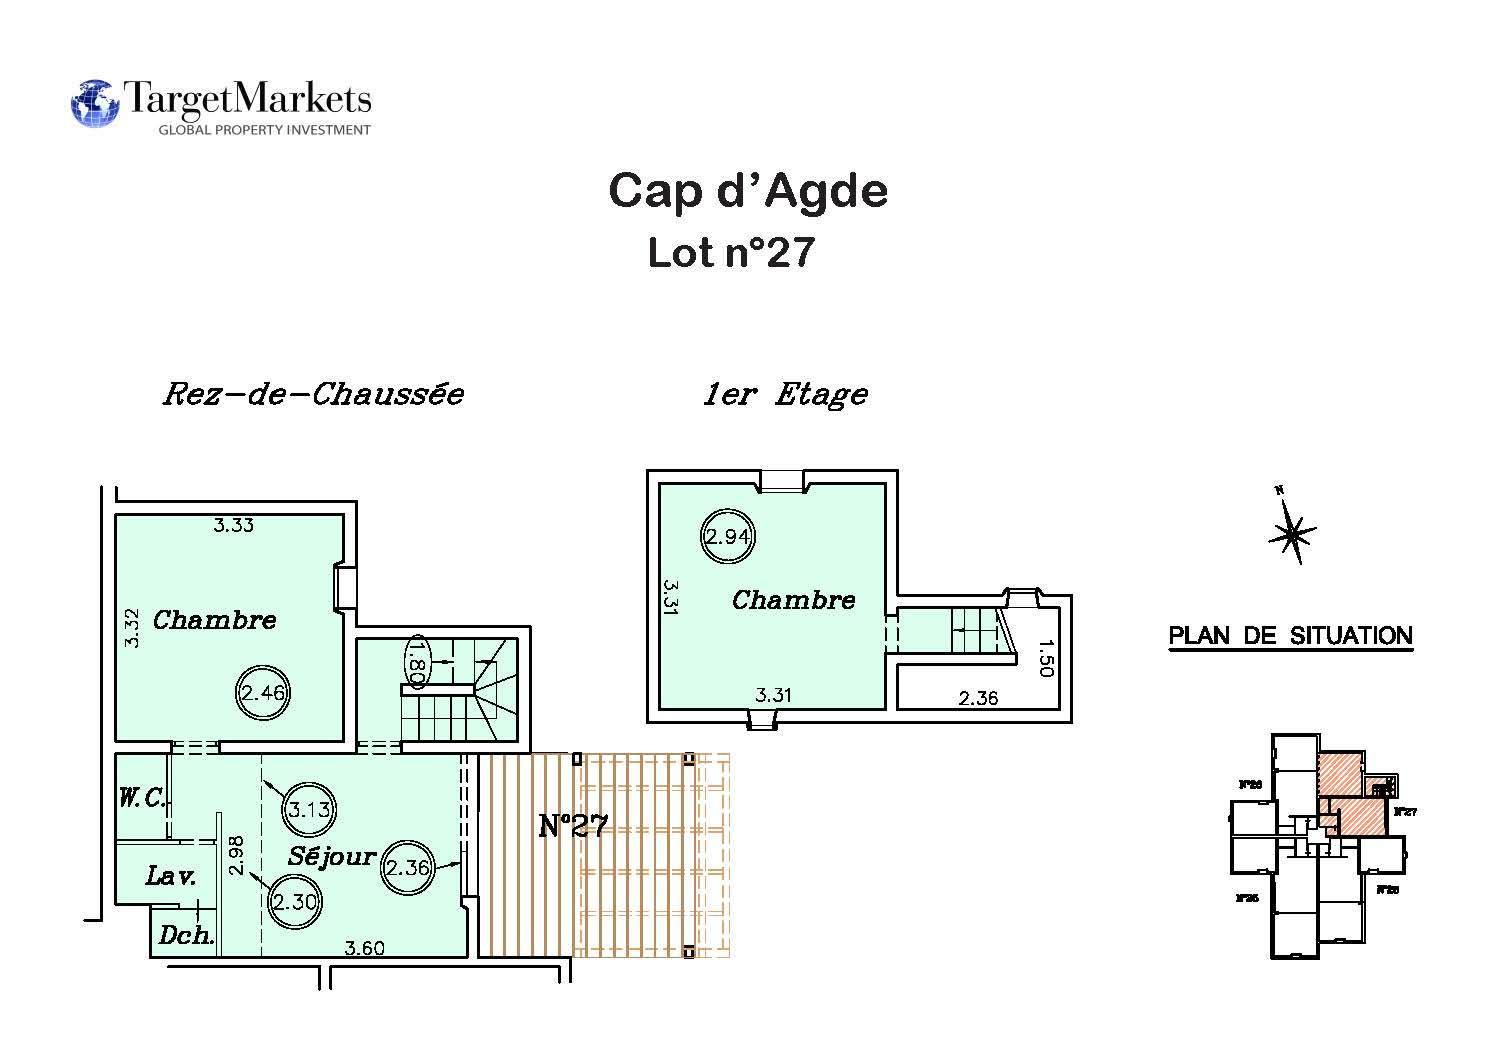 Armchair Property Investor Armchair Property Investor 28